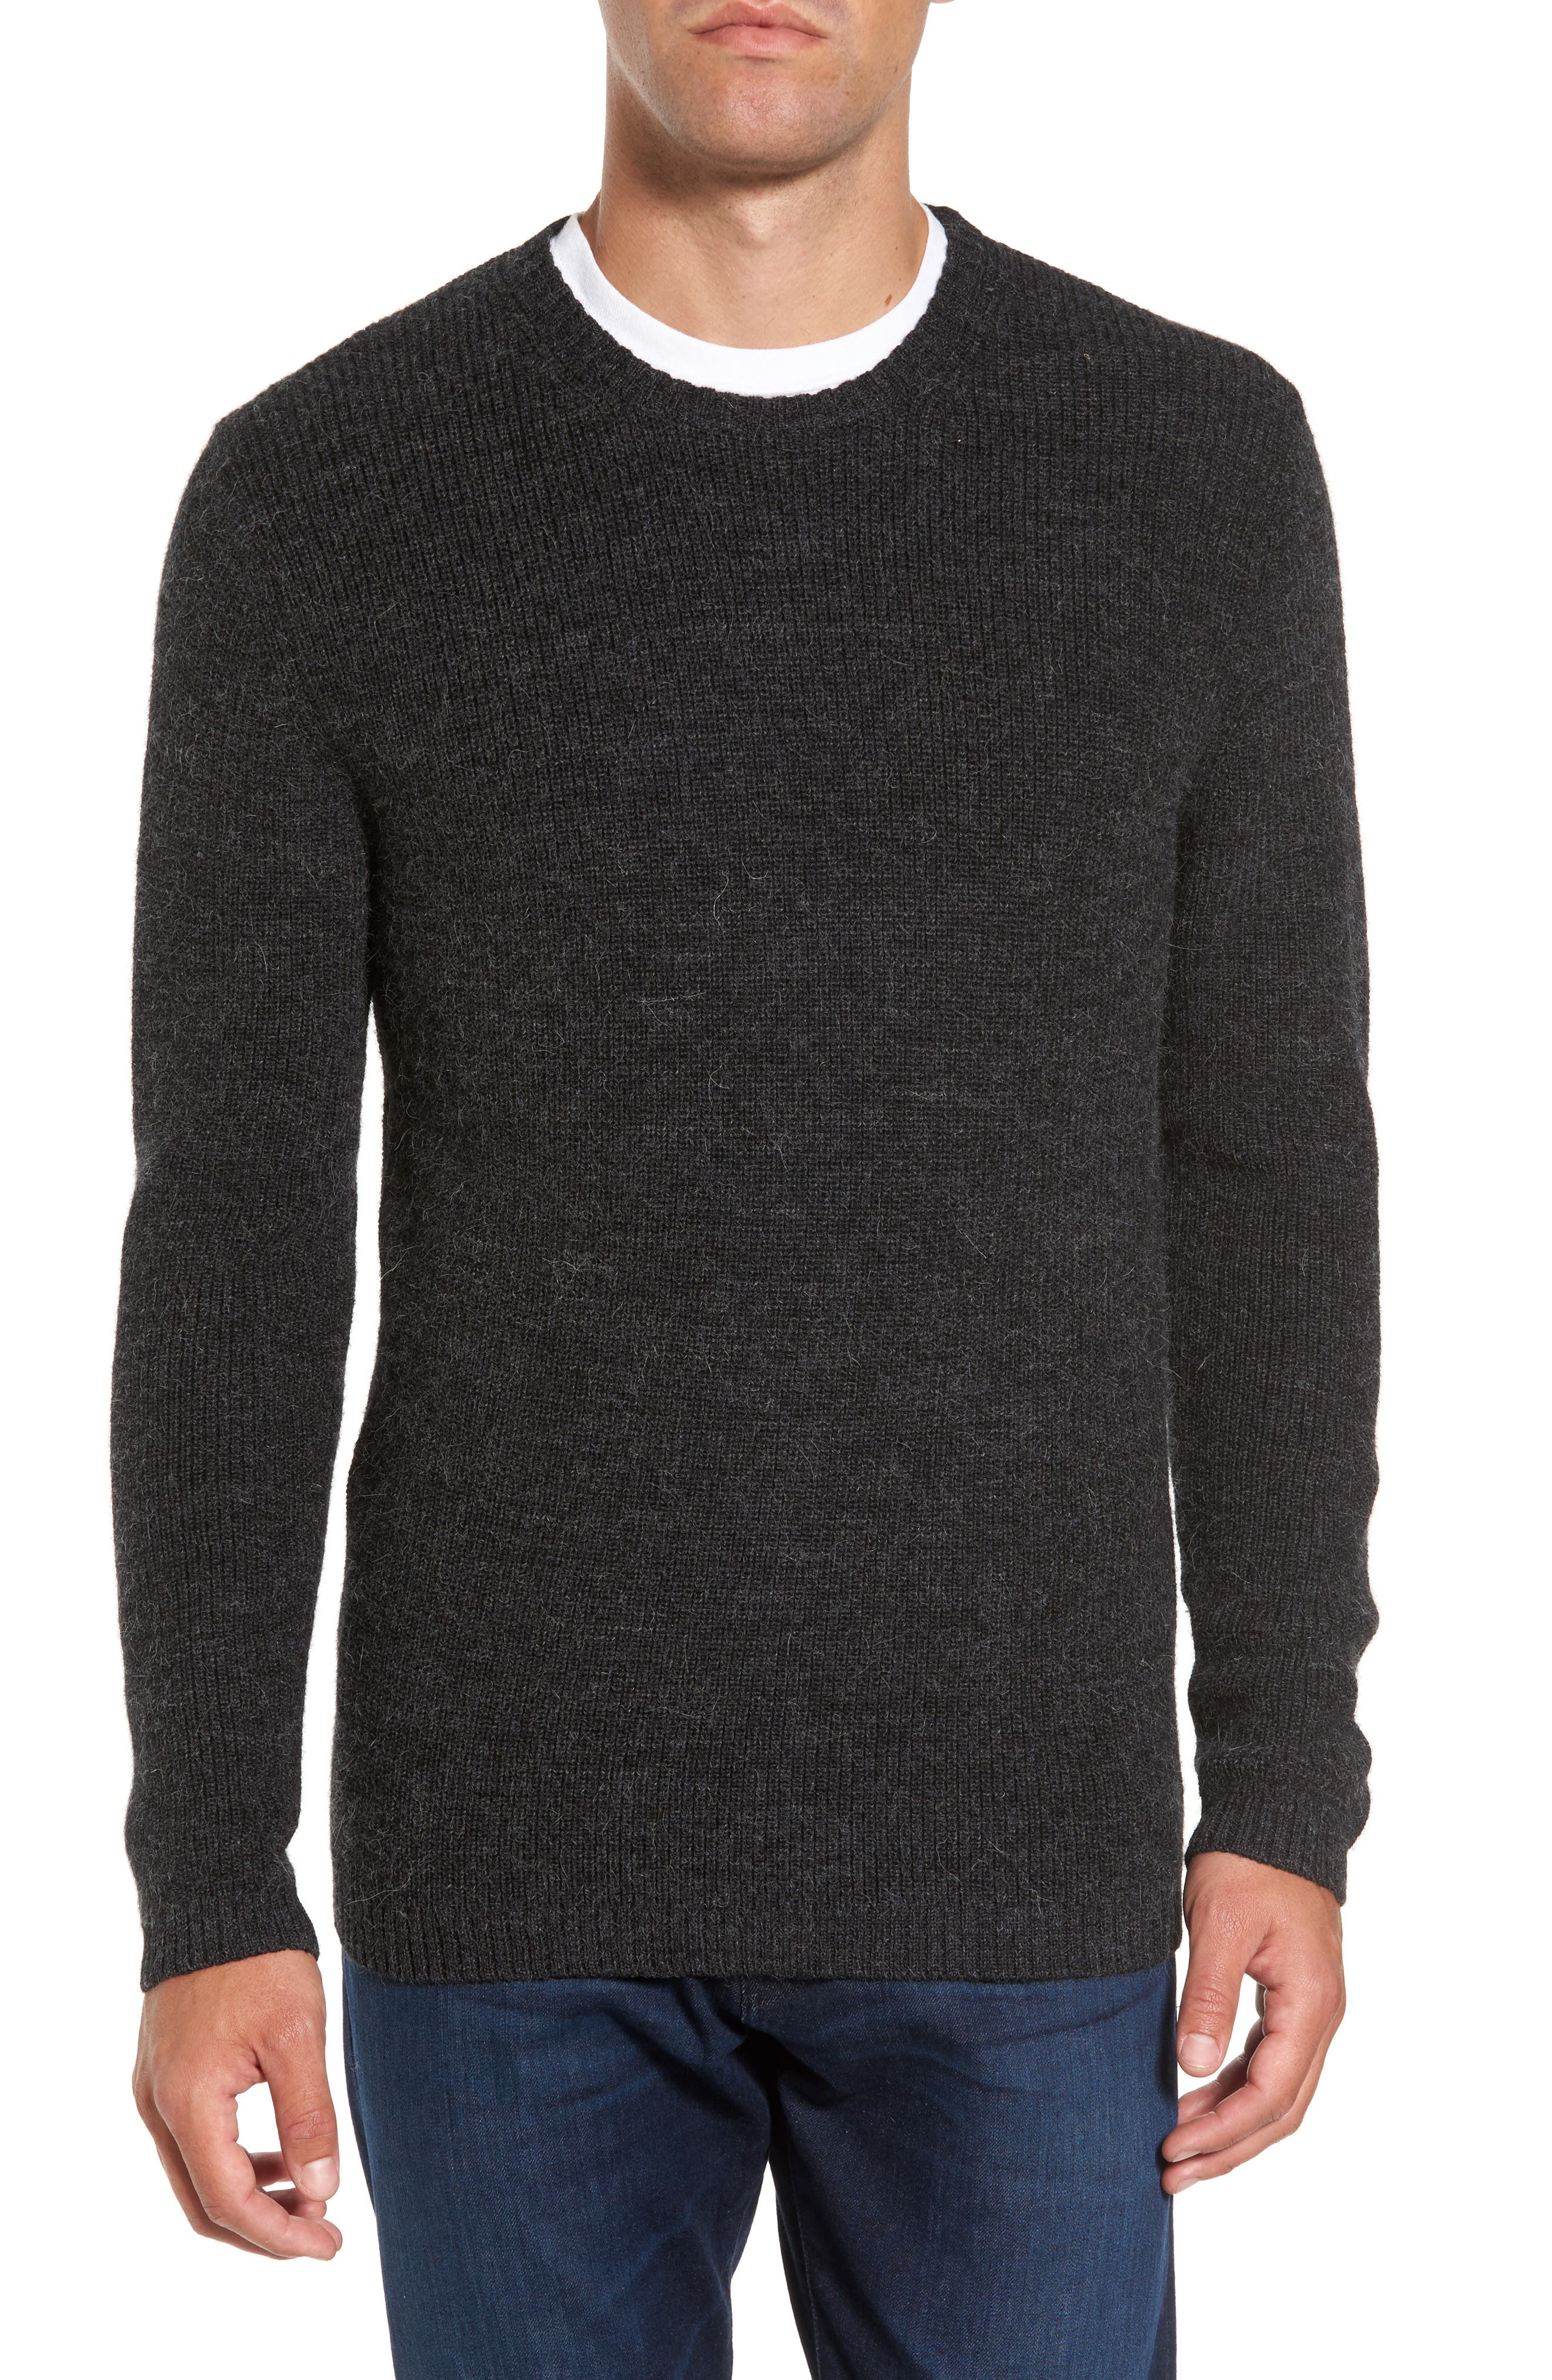 Alternate Image 1 Selected - Rodd & Gunn Whalers Bay Merino Wool Blend Sweater